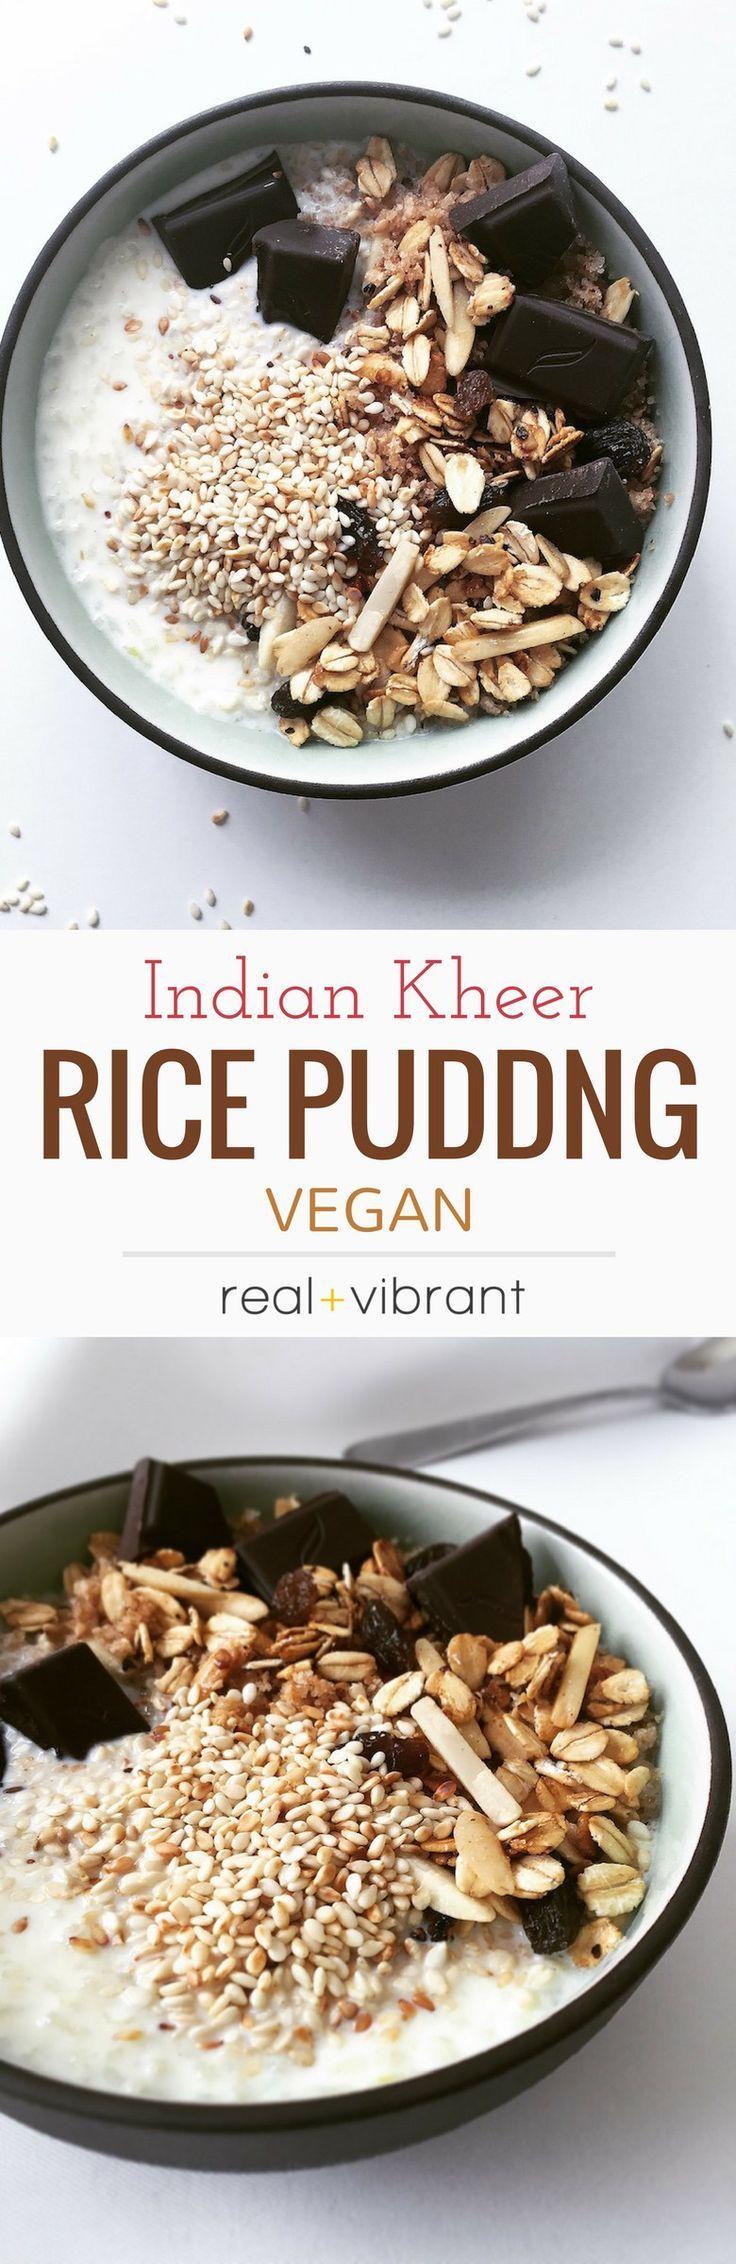 Vegan Indian Kheer Rice Pudding - Pinterest